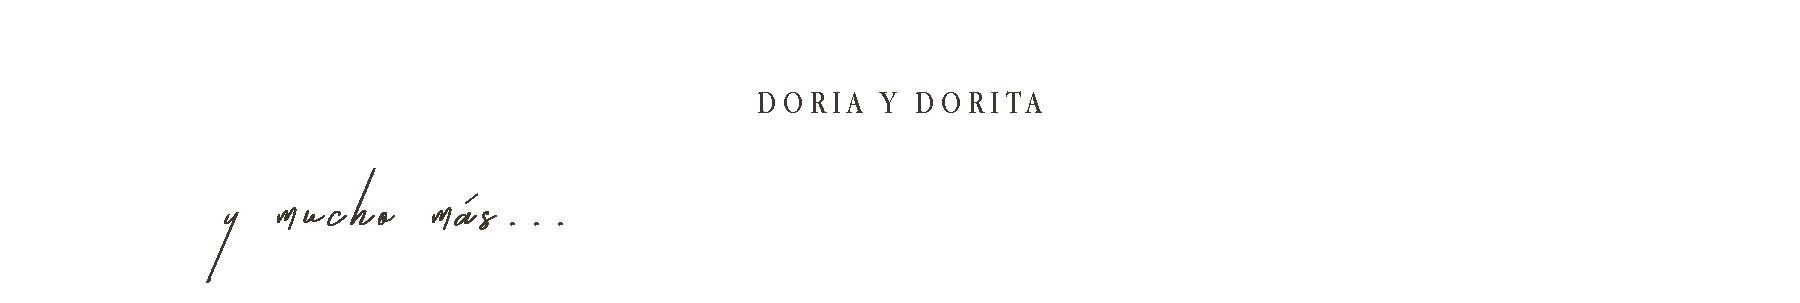 dyd | Horizonte